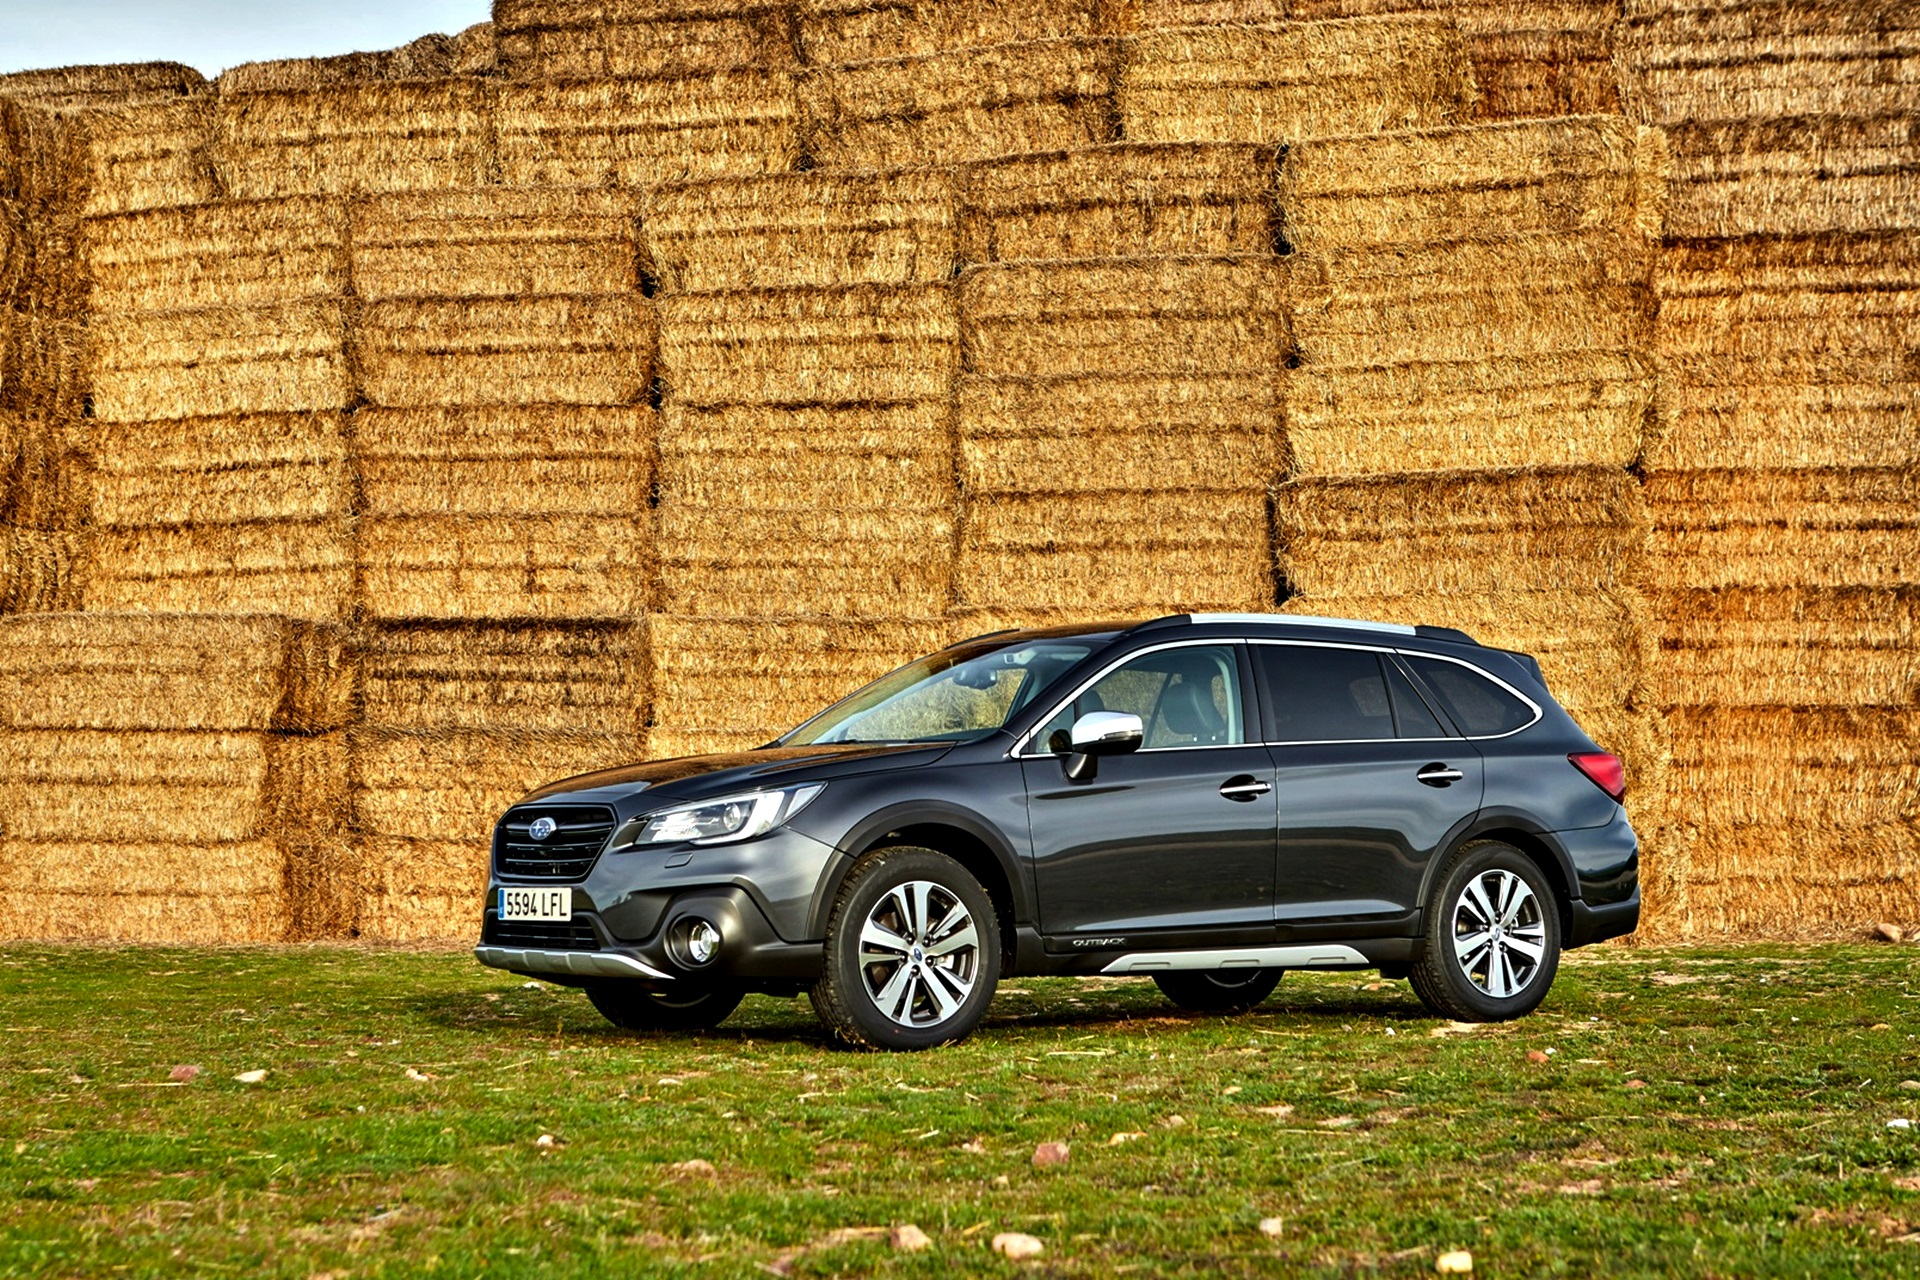 Subaru Outback Glp Promocion 16 (1)